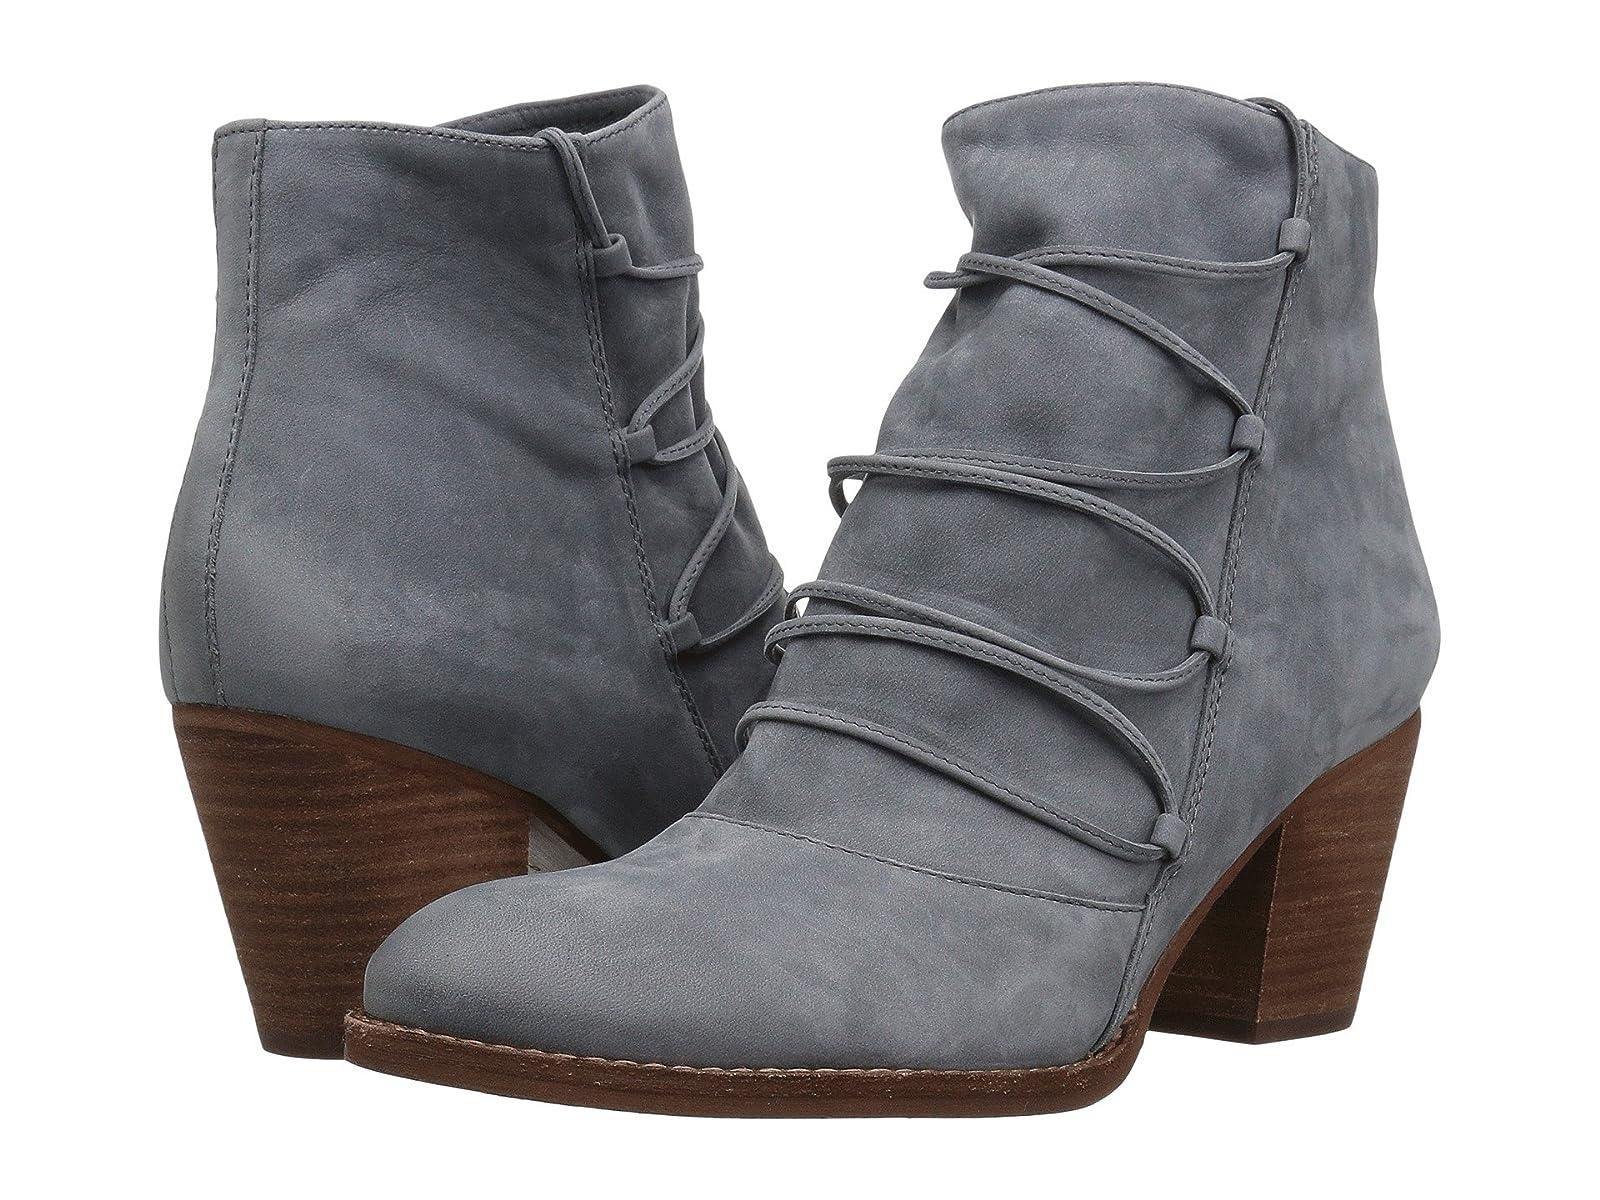 Sam Edelman MillardCheap and distinctive eye-catching shoes